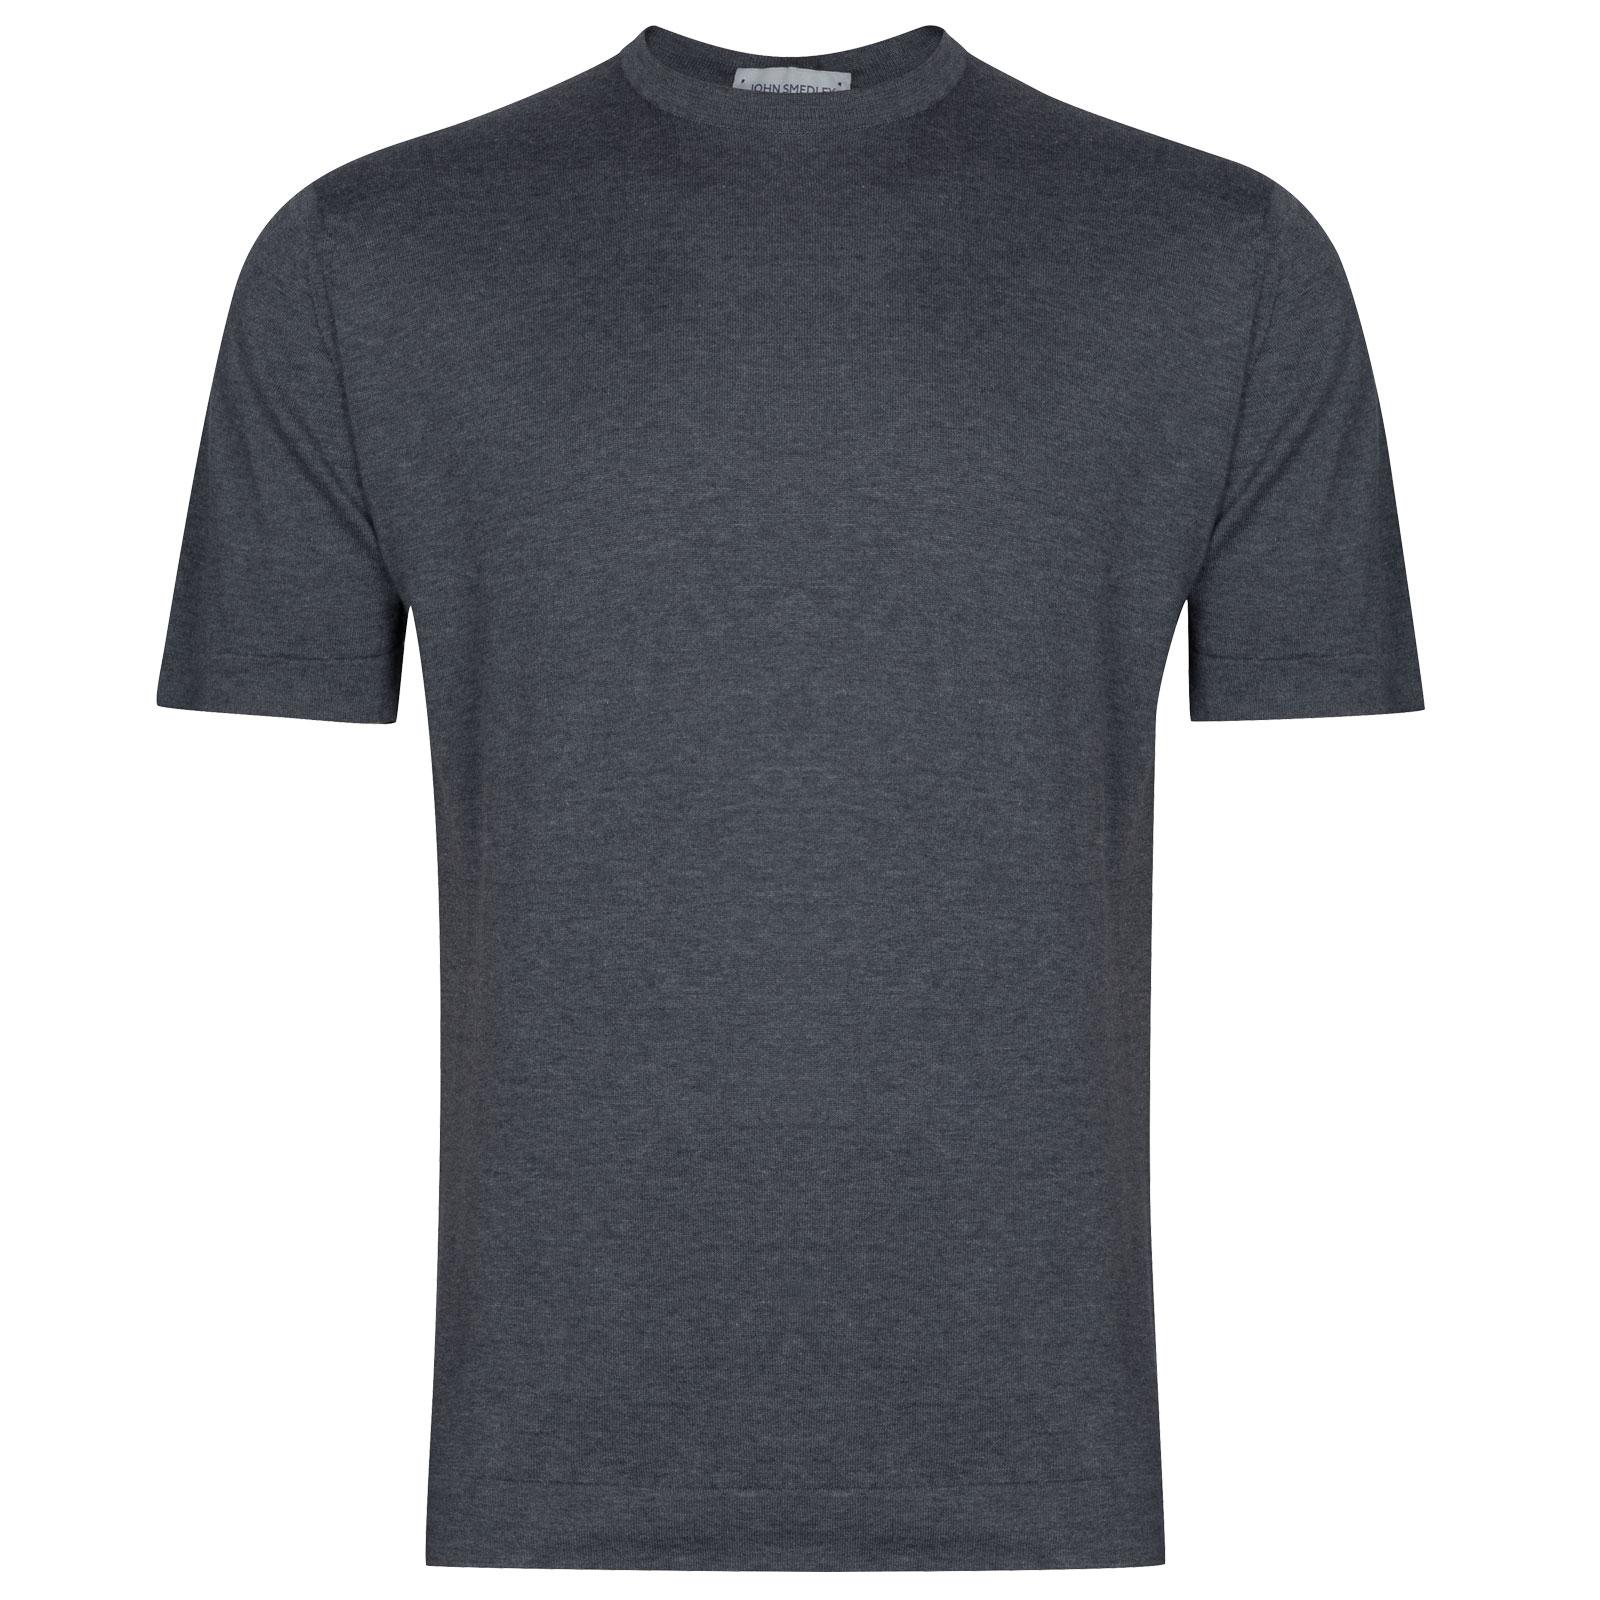 John Smedley Lorca in Charcoal T-Shirt-XLG